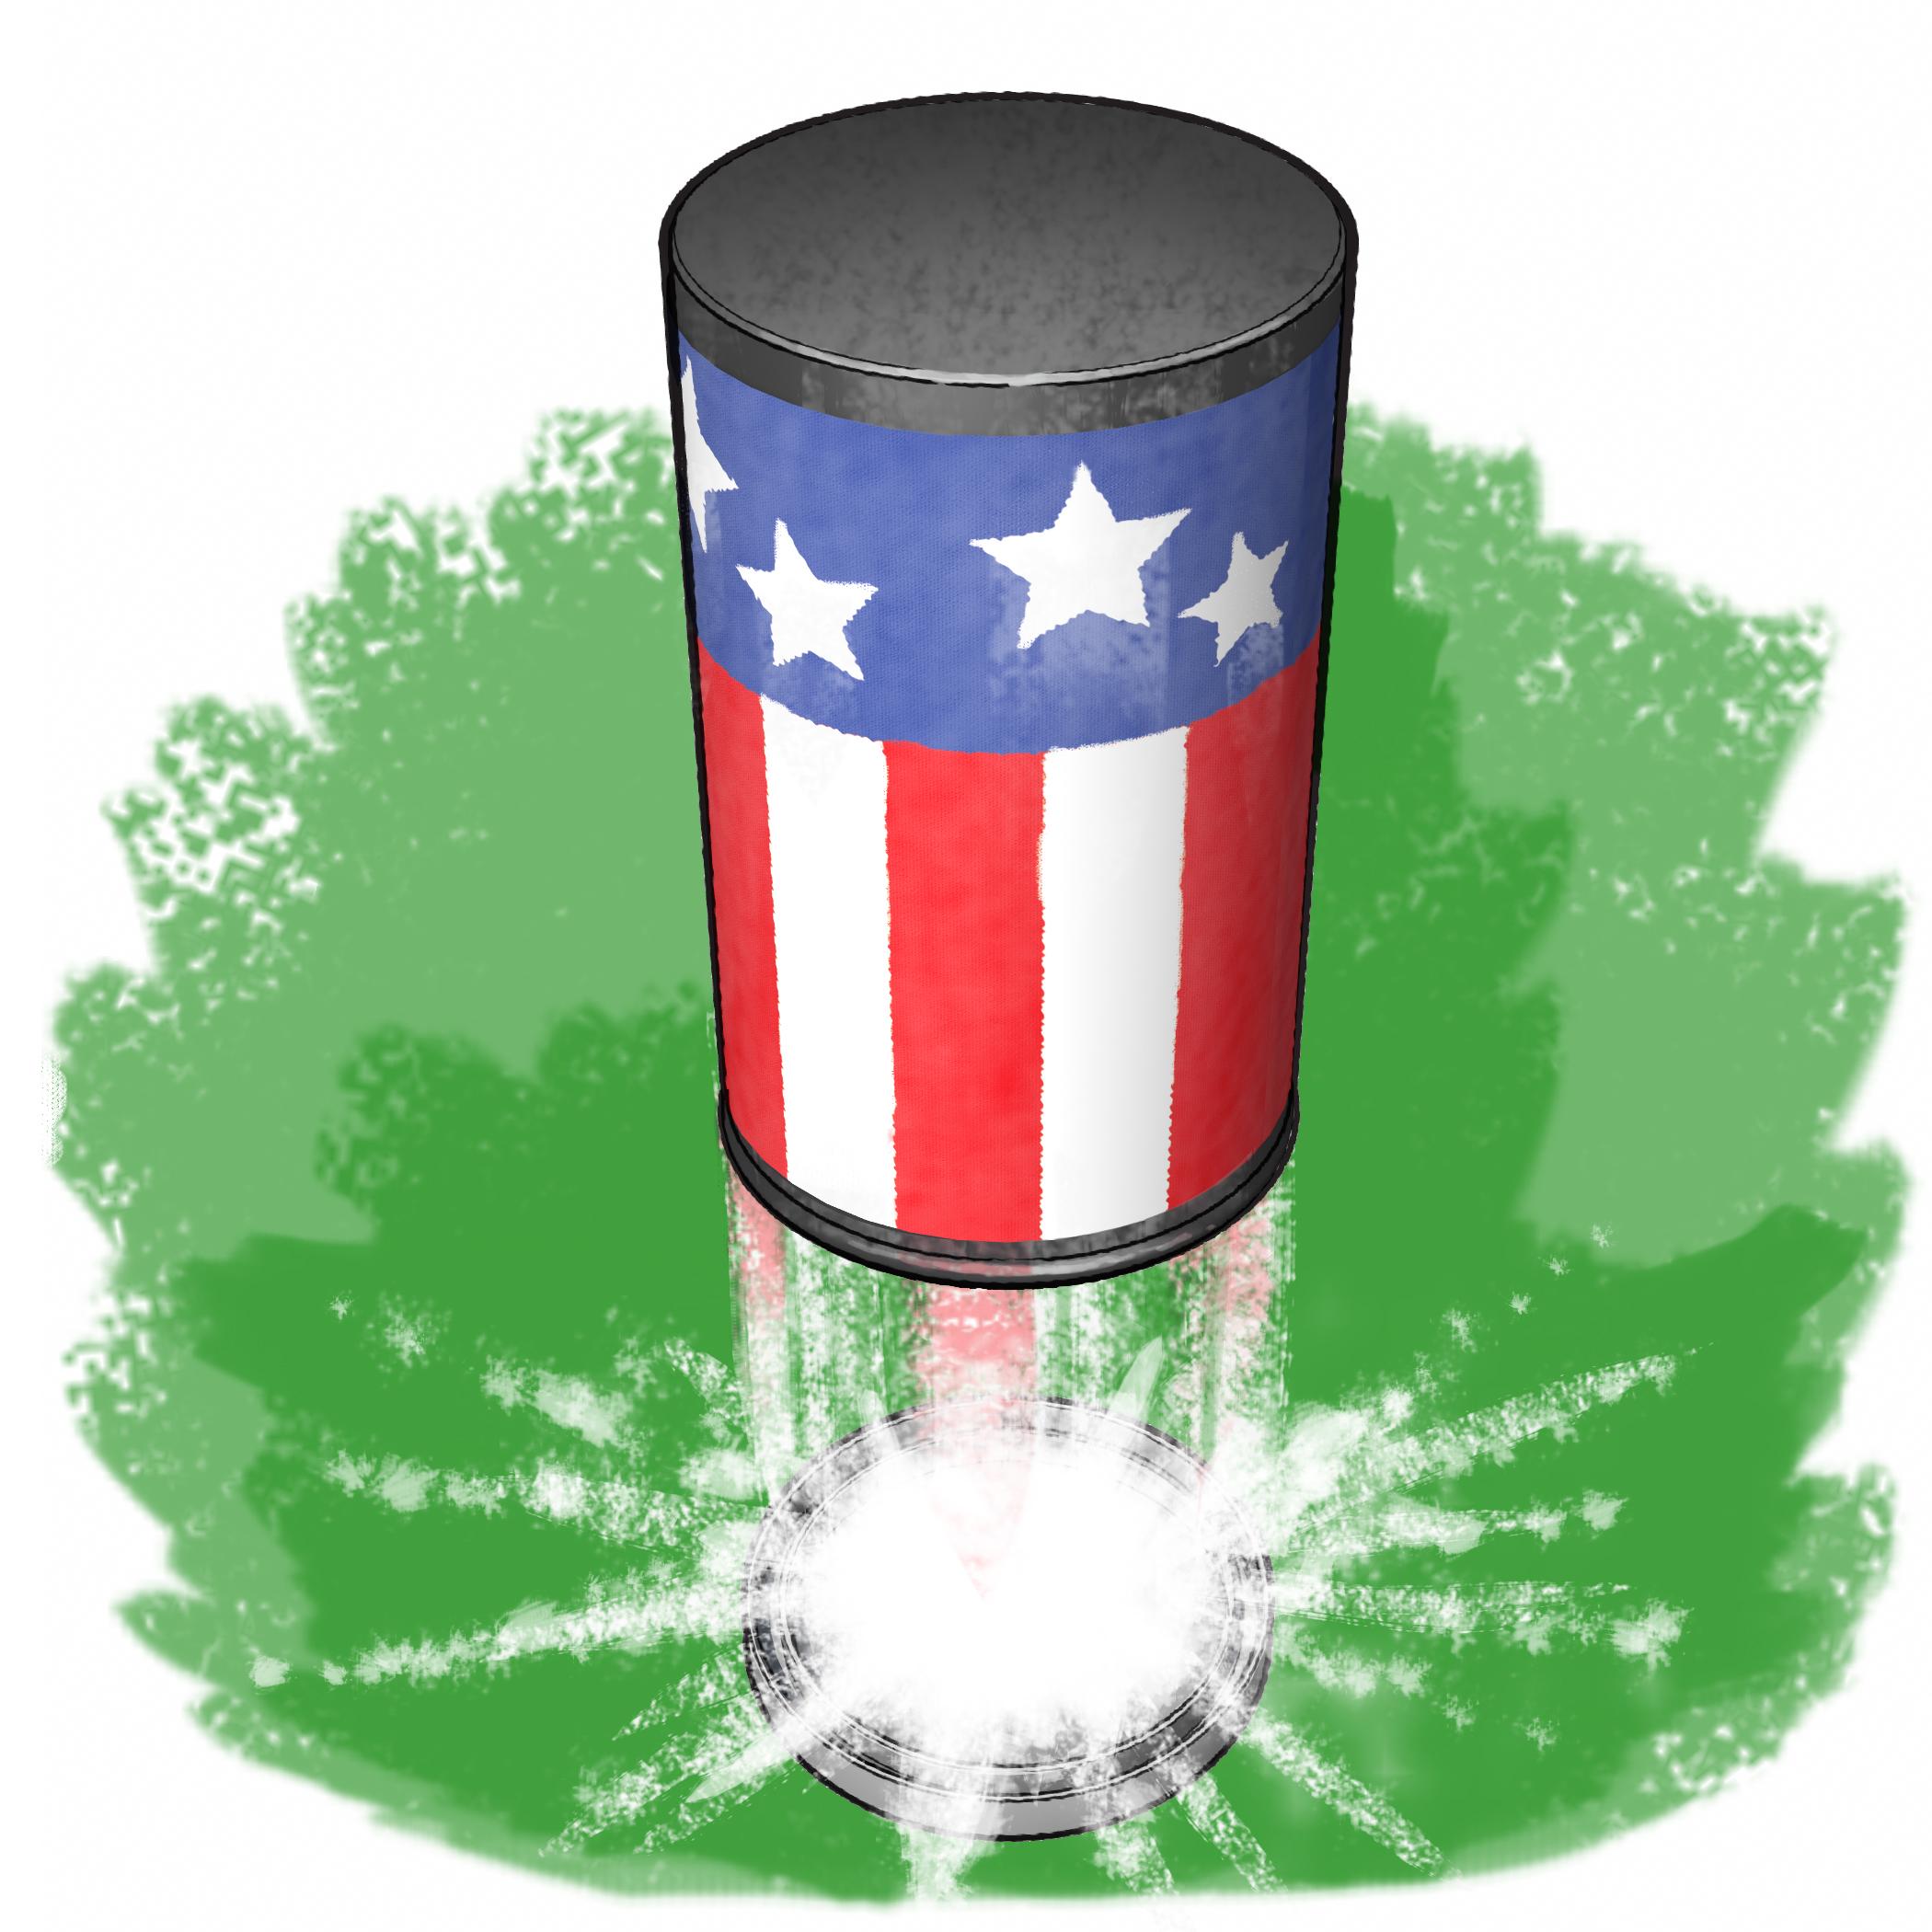 Scientific American - Bring Science Home - Homemade Rocket